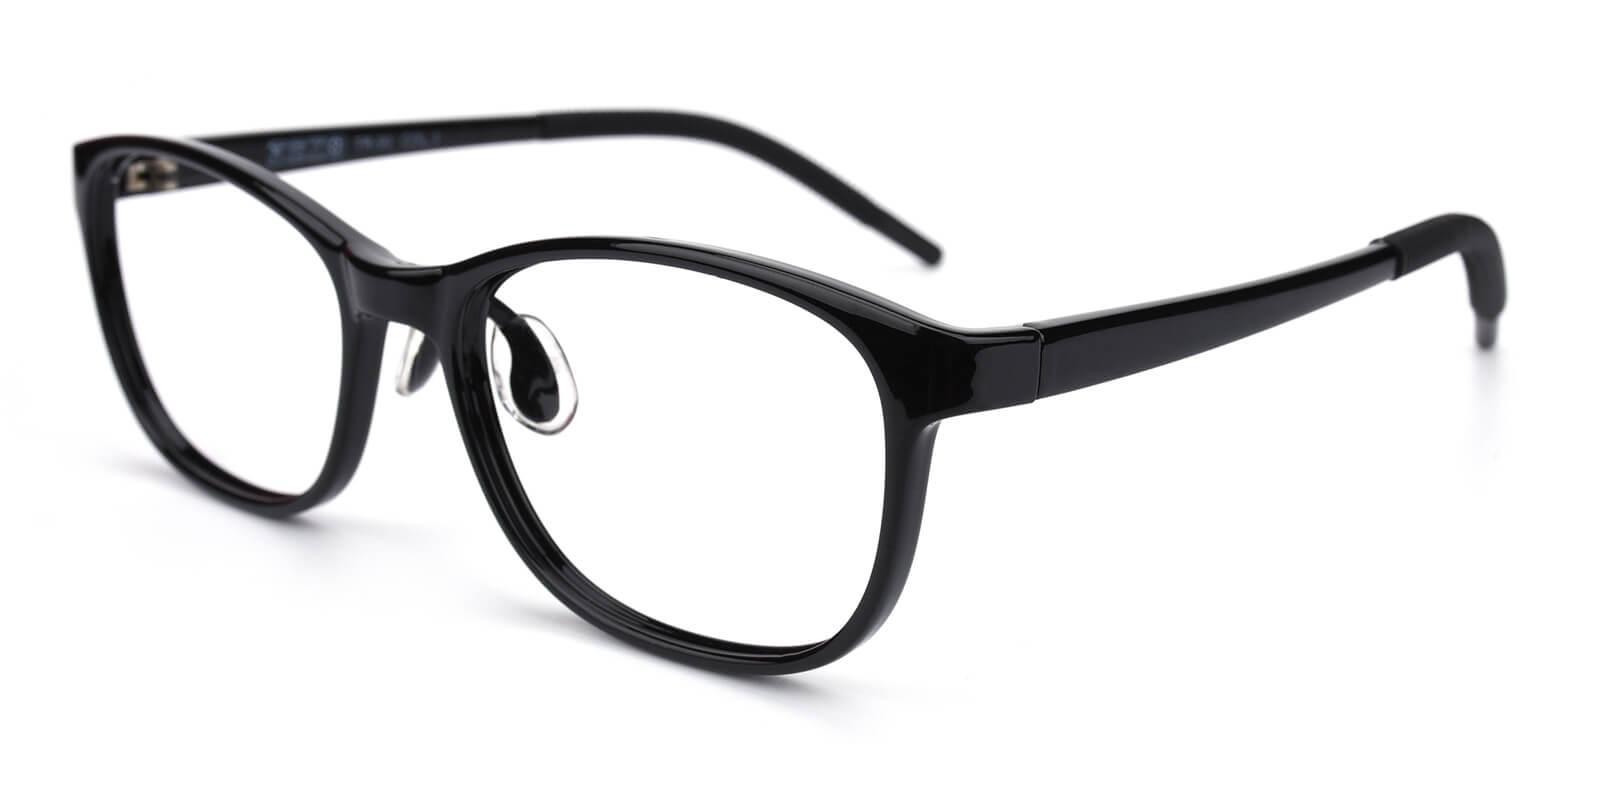 Lochlosa-Black-Rectangle-TR-Eyeglasses-additional1